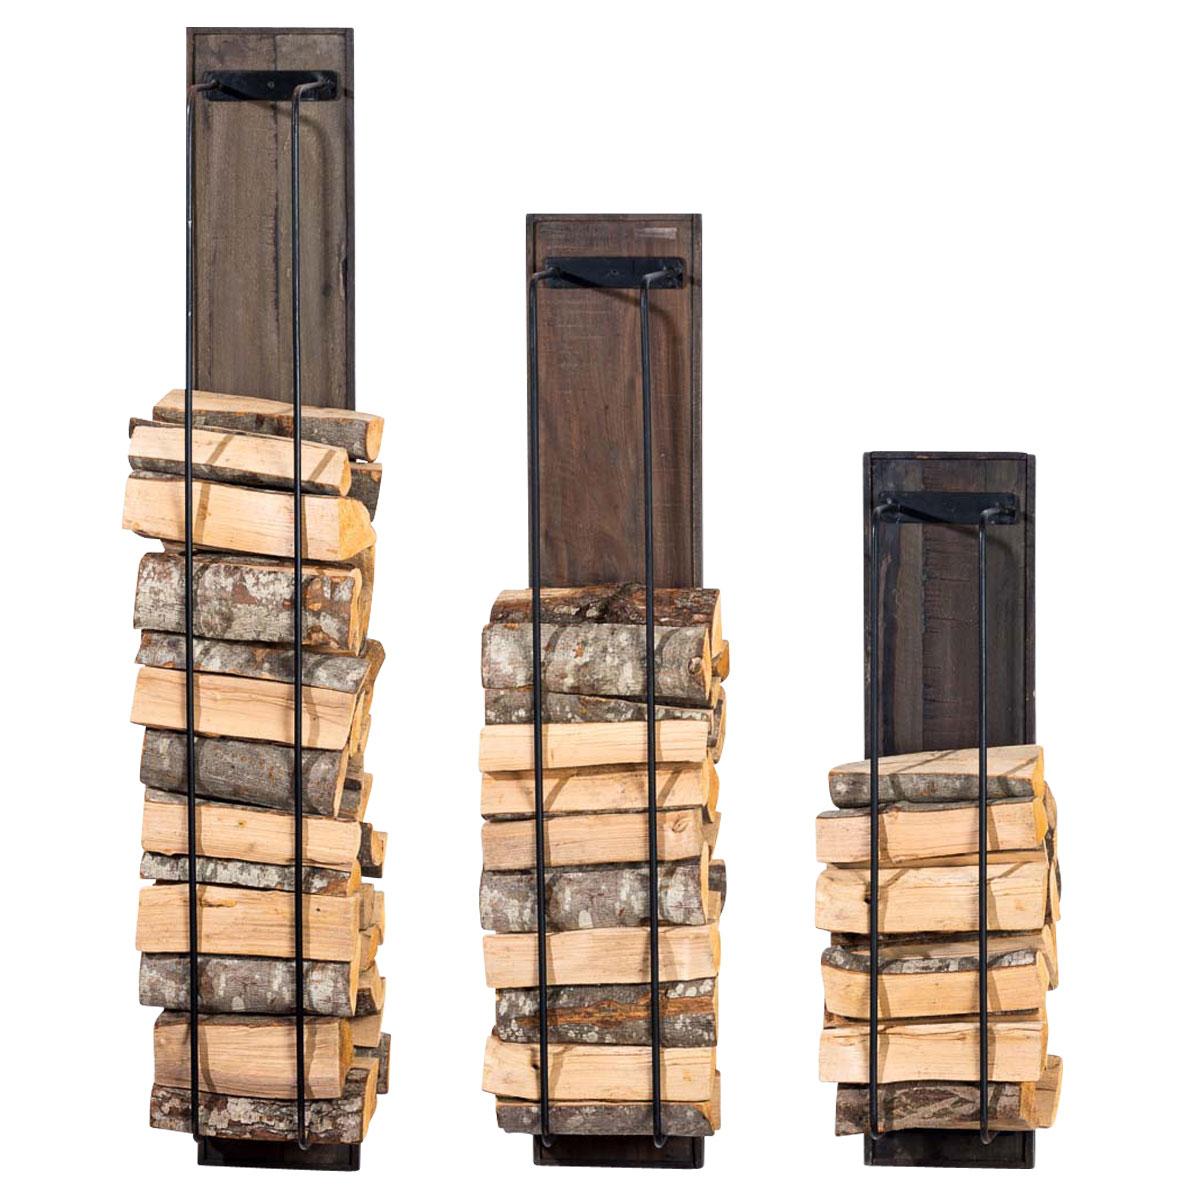 porte b ches mural houston rangement bois chauffage. Black Bedroom Furniture Sets. Home Design Ideas